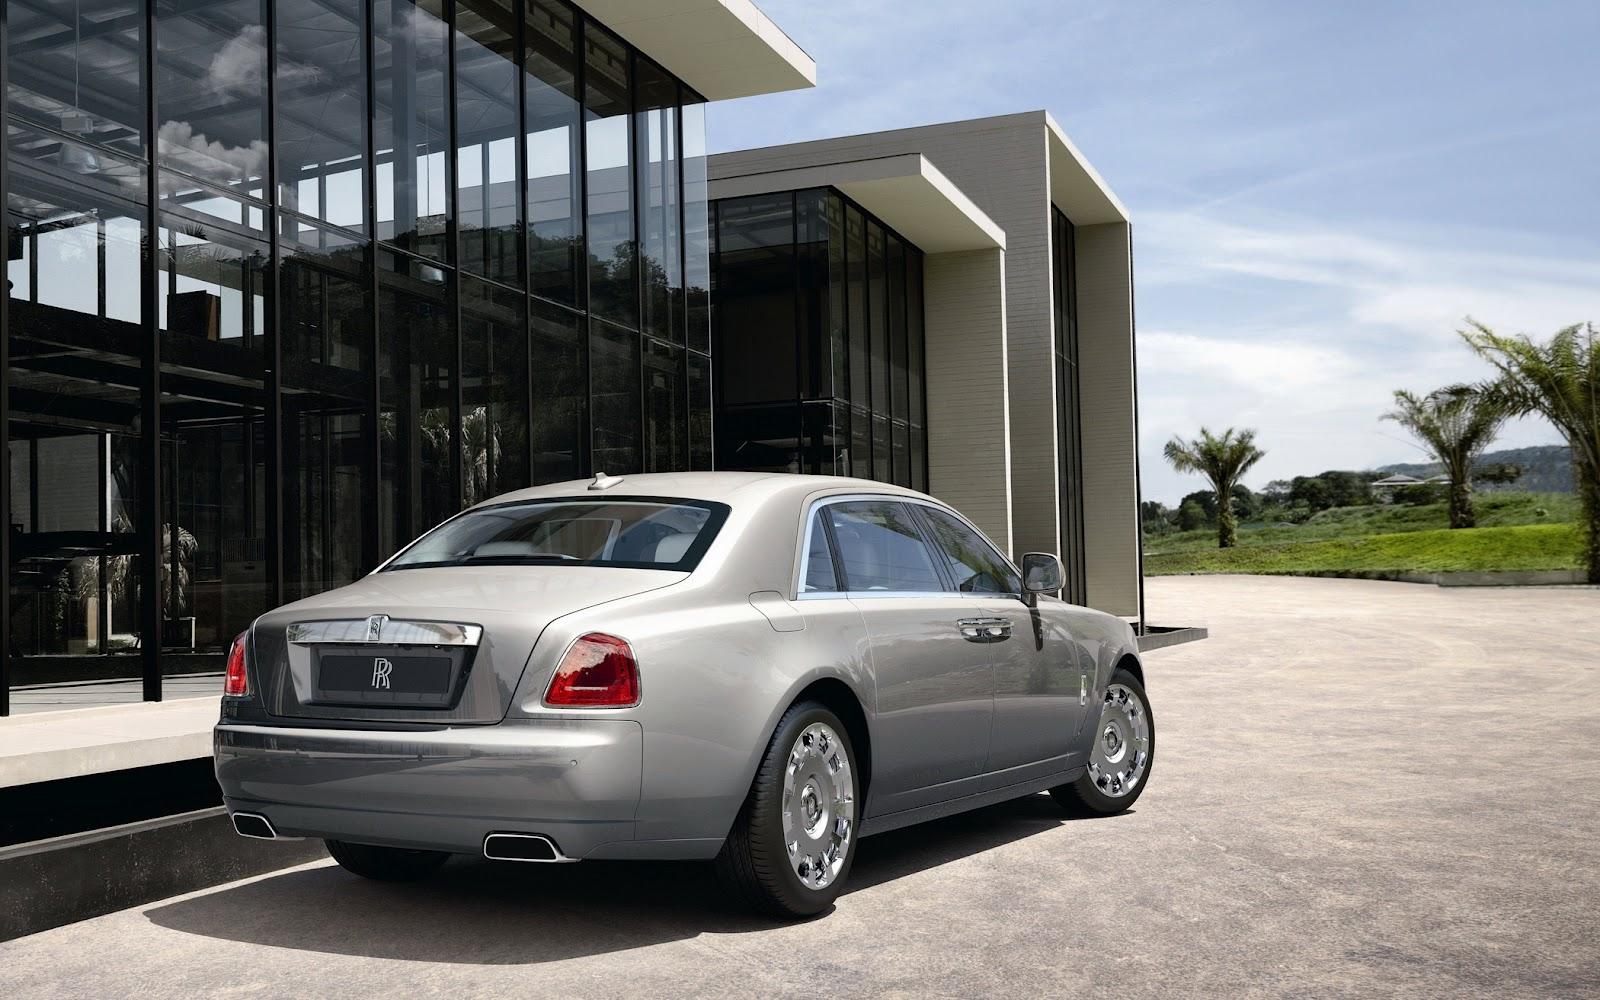 Rolls Royce Ghost Vs Phantom